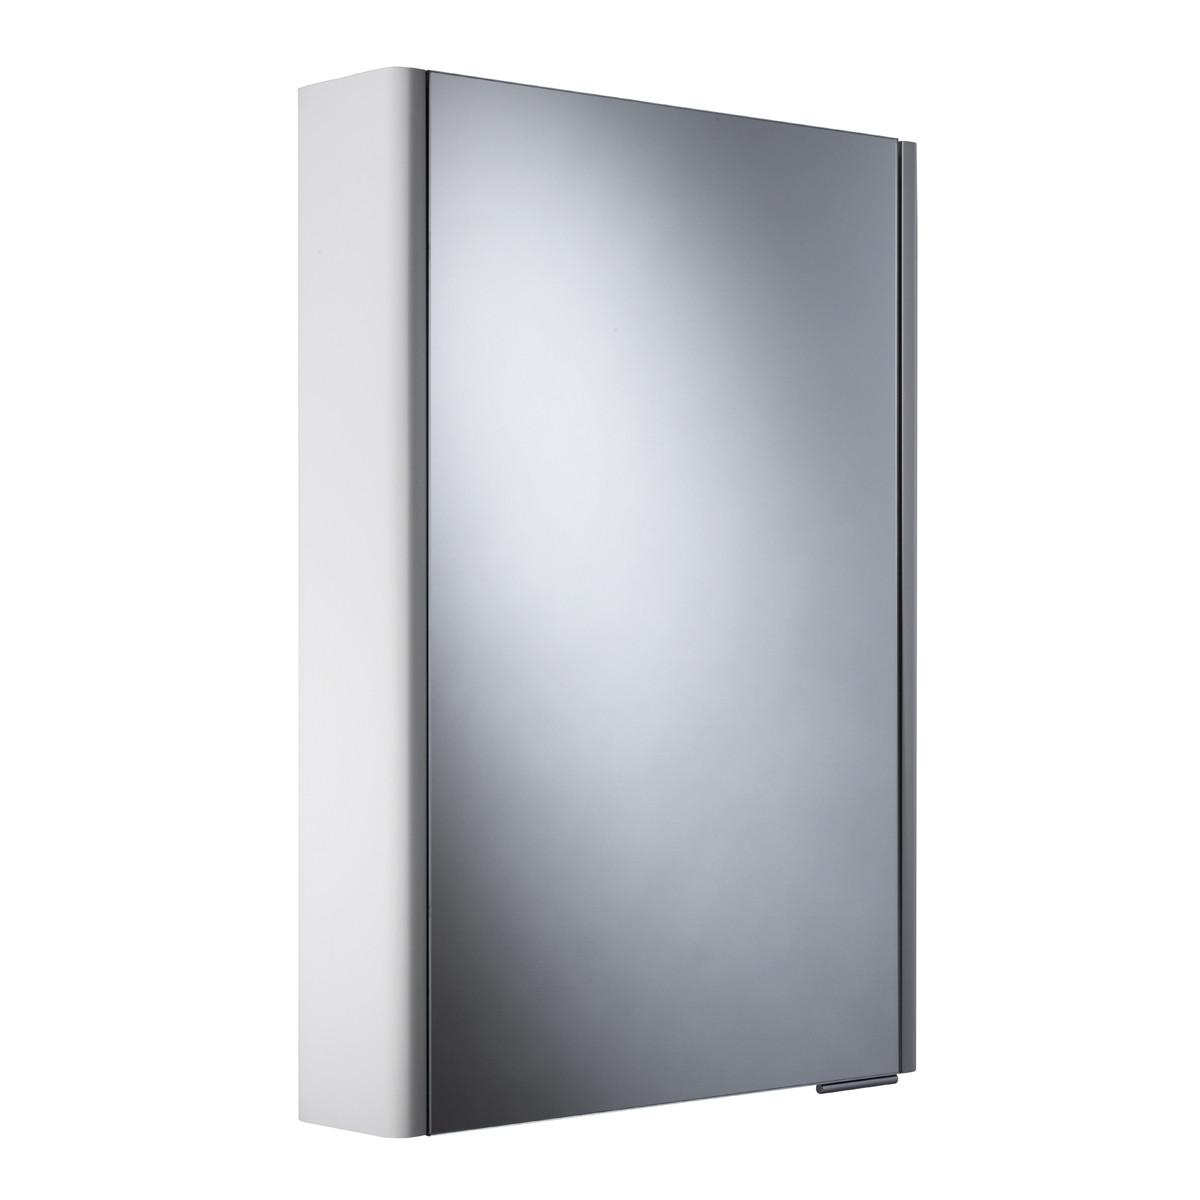 roper rhodes definition phase single glass door cabinet